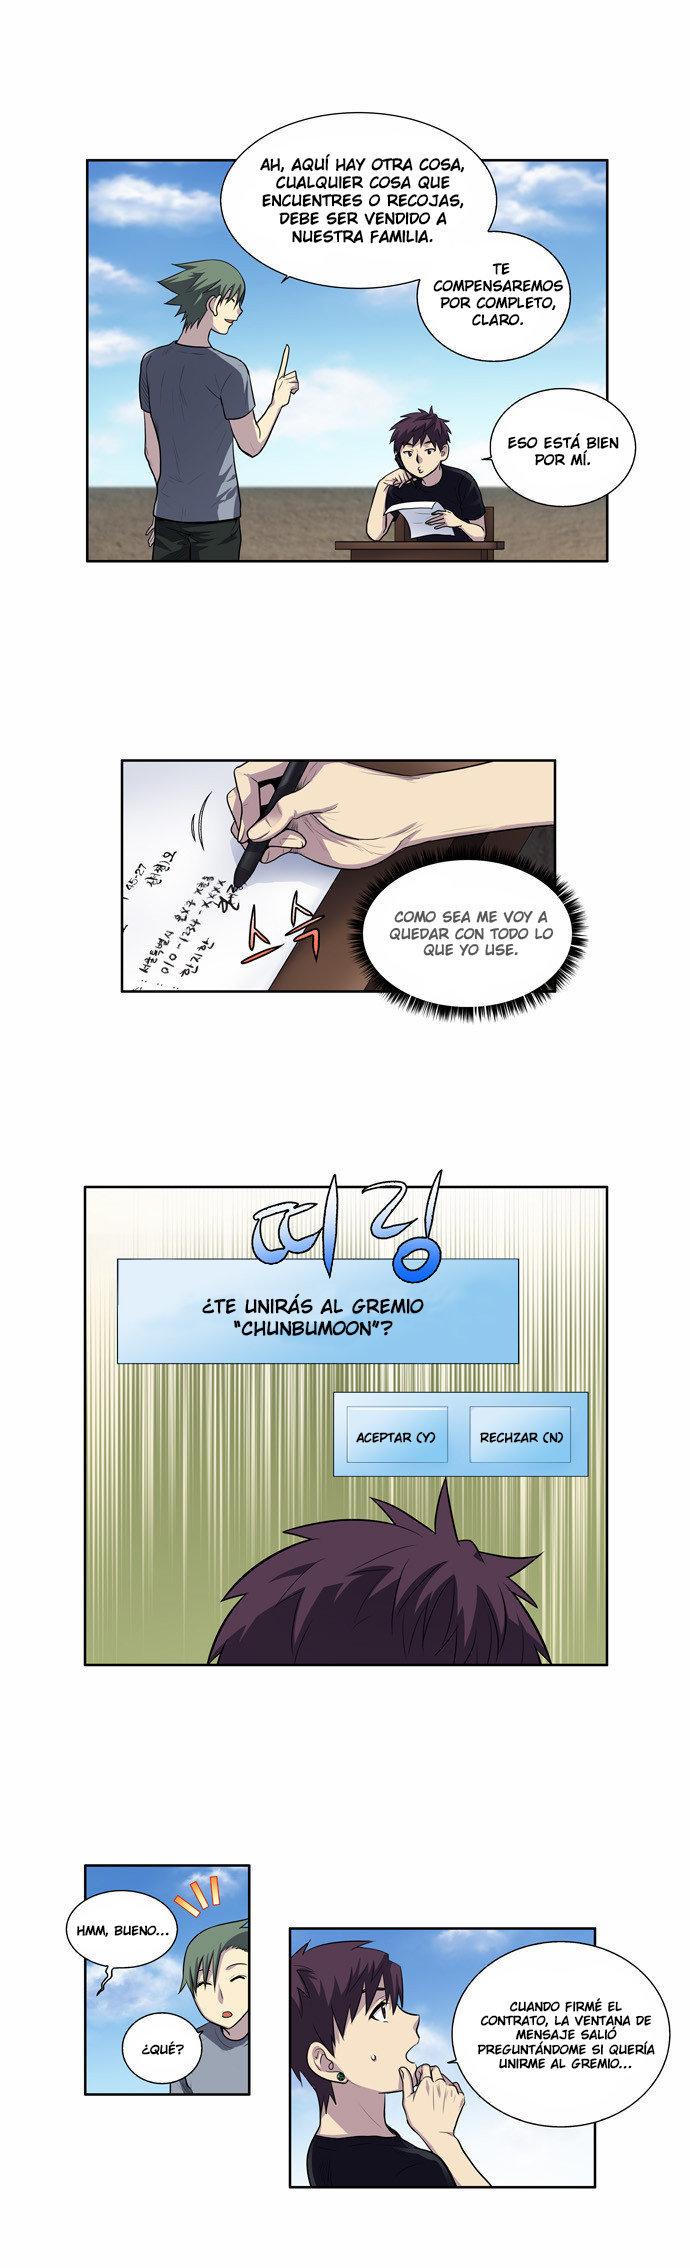 http://c5.ninemanga.com/es_manga/61/1725/446811/5dd53e1664525233d42f0464ecfb47f1.jpg Page 6